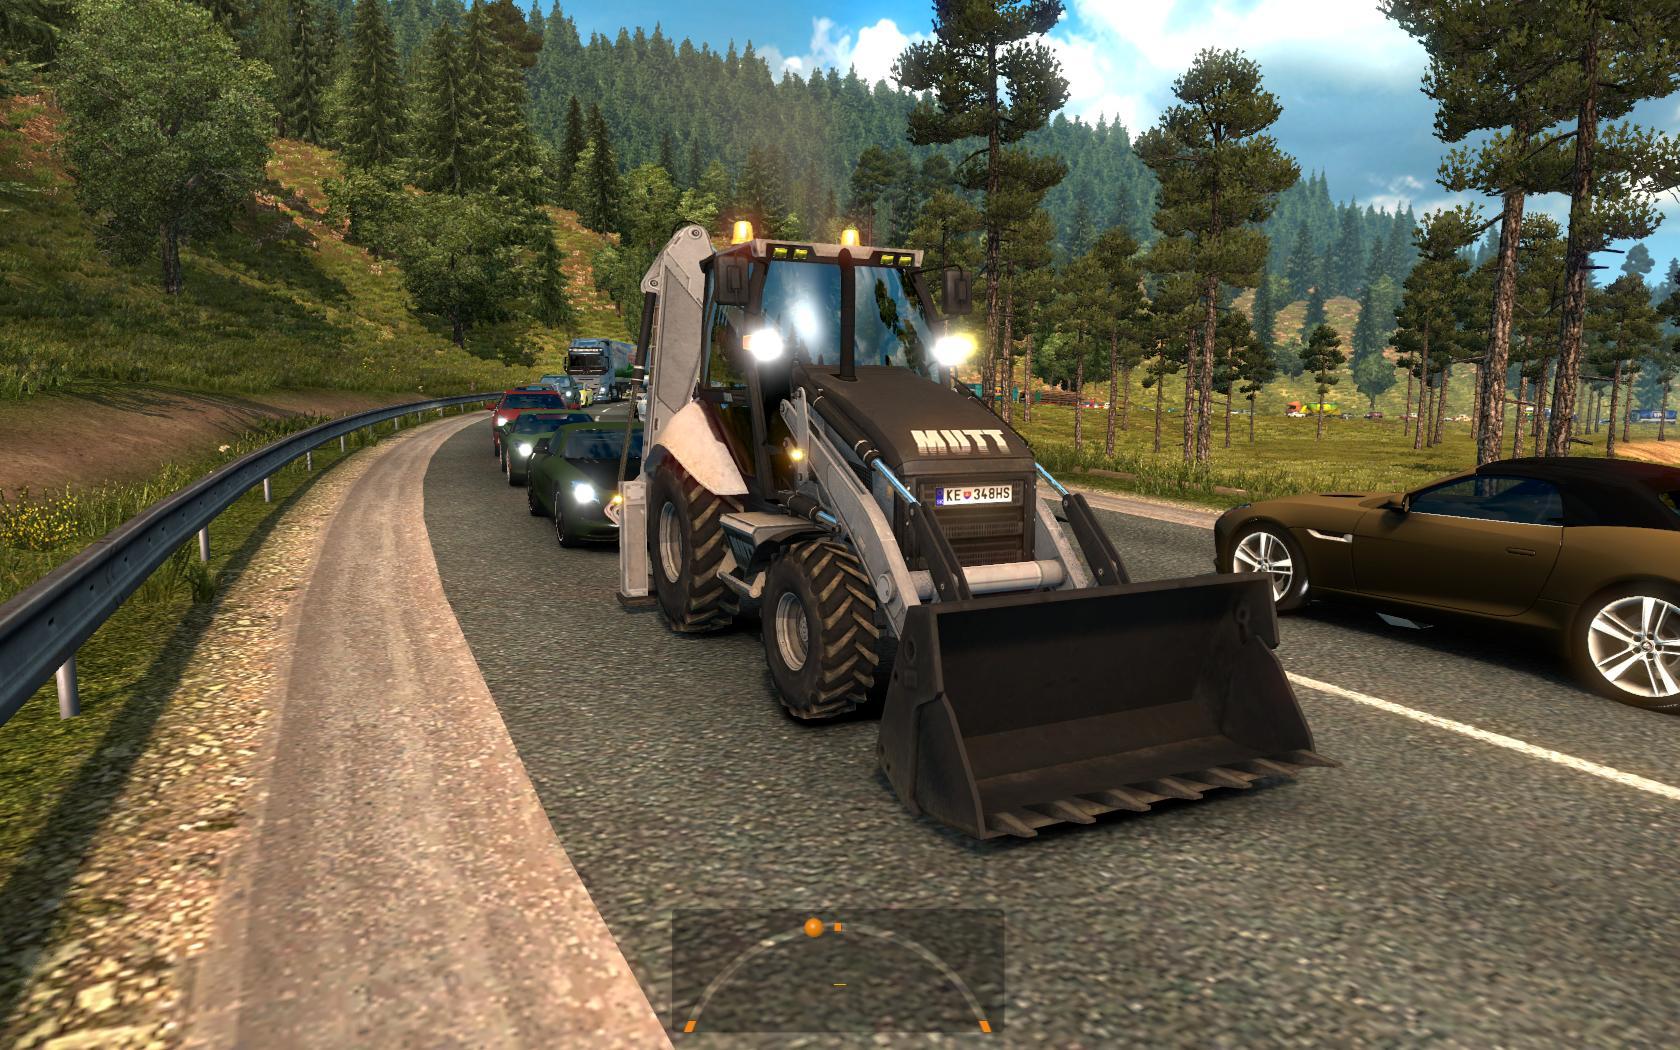 Euro Truck Simulator 2 Моды На Руки На Руле